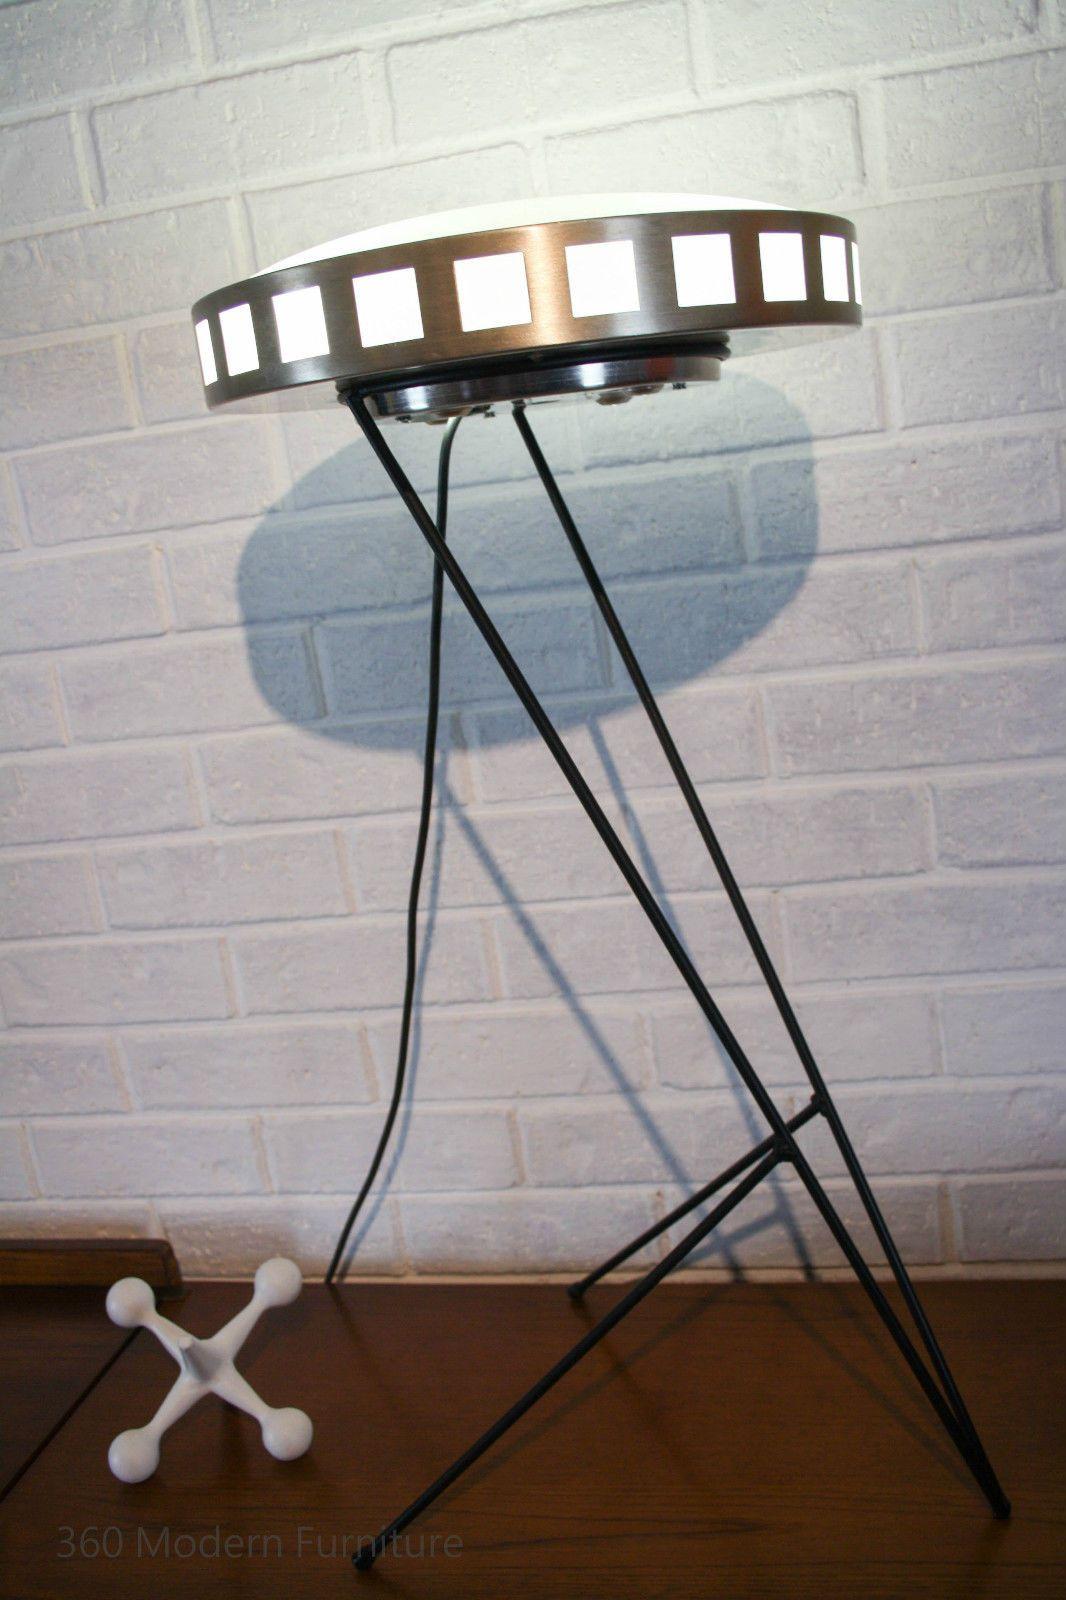 Kempthorne Lighting 1950s Australia Lamp Shade With Custom Hairpin Stand Mid Century Modern Floor Table Ufo Retro Vintage Danish Sputnik Atomic